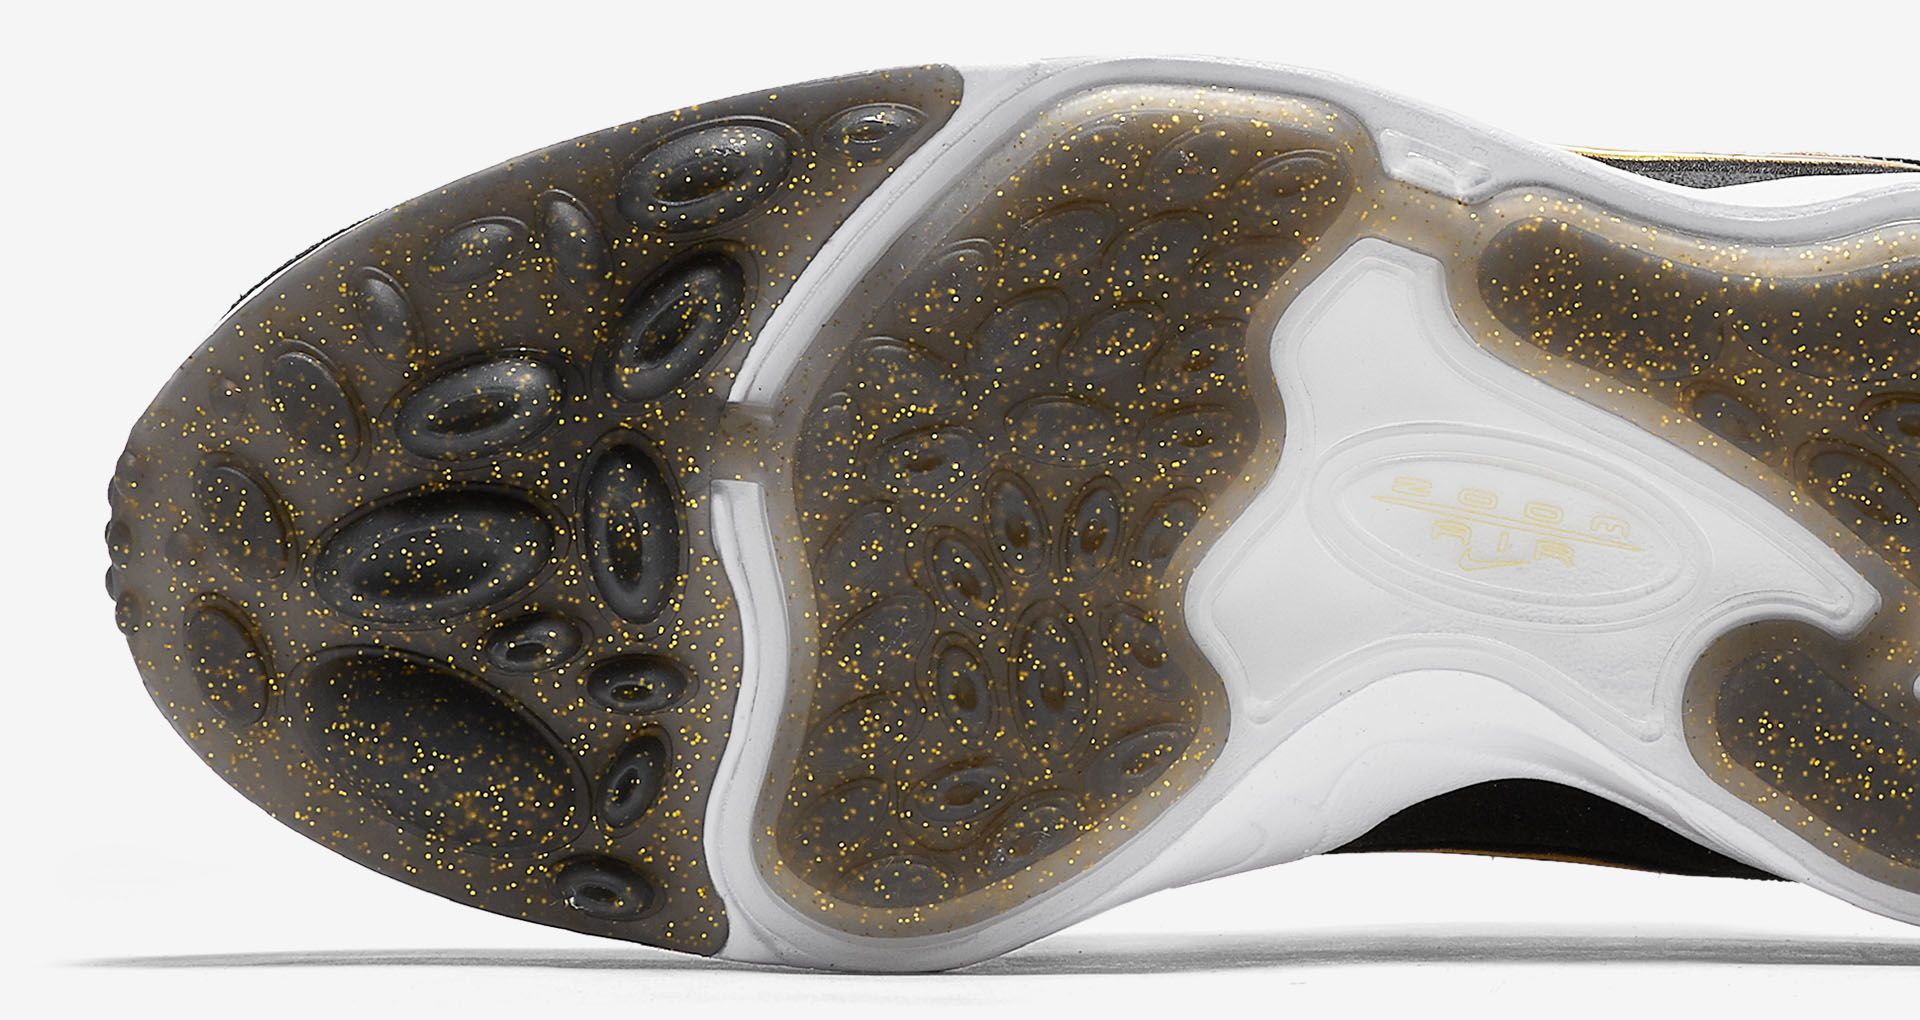 new concept 37e2d 0136b Nike Air Zoom Spiridon Golden Shine